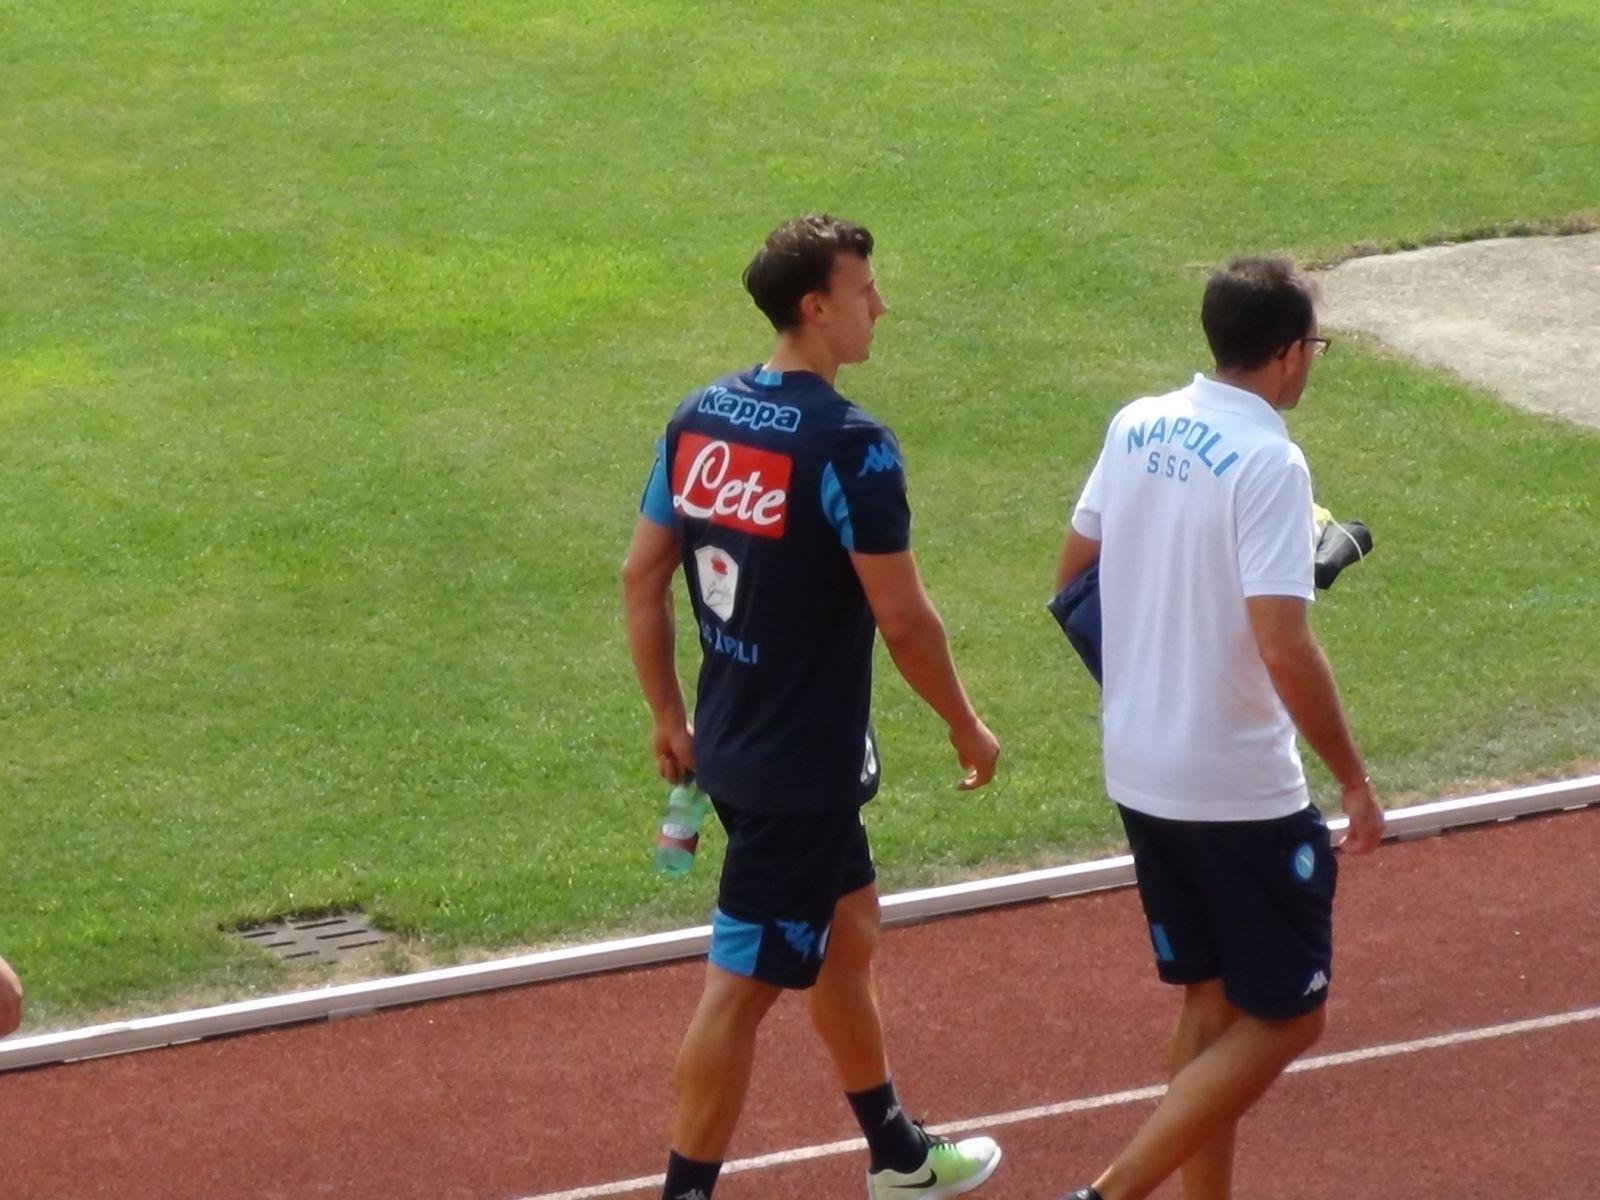 http://www.calcionapoli24.it/thumbs/allegati/large/1438159261_382.jpg